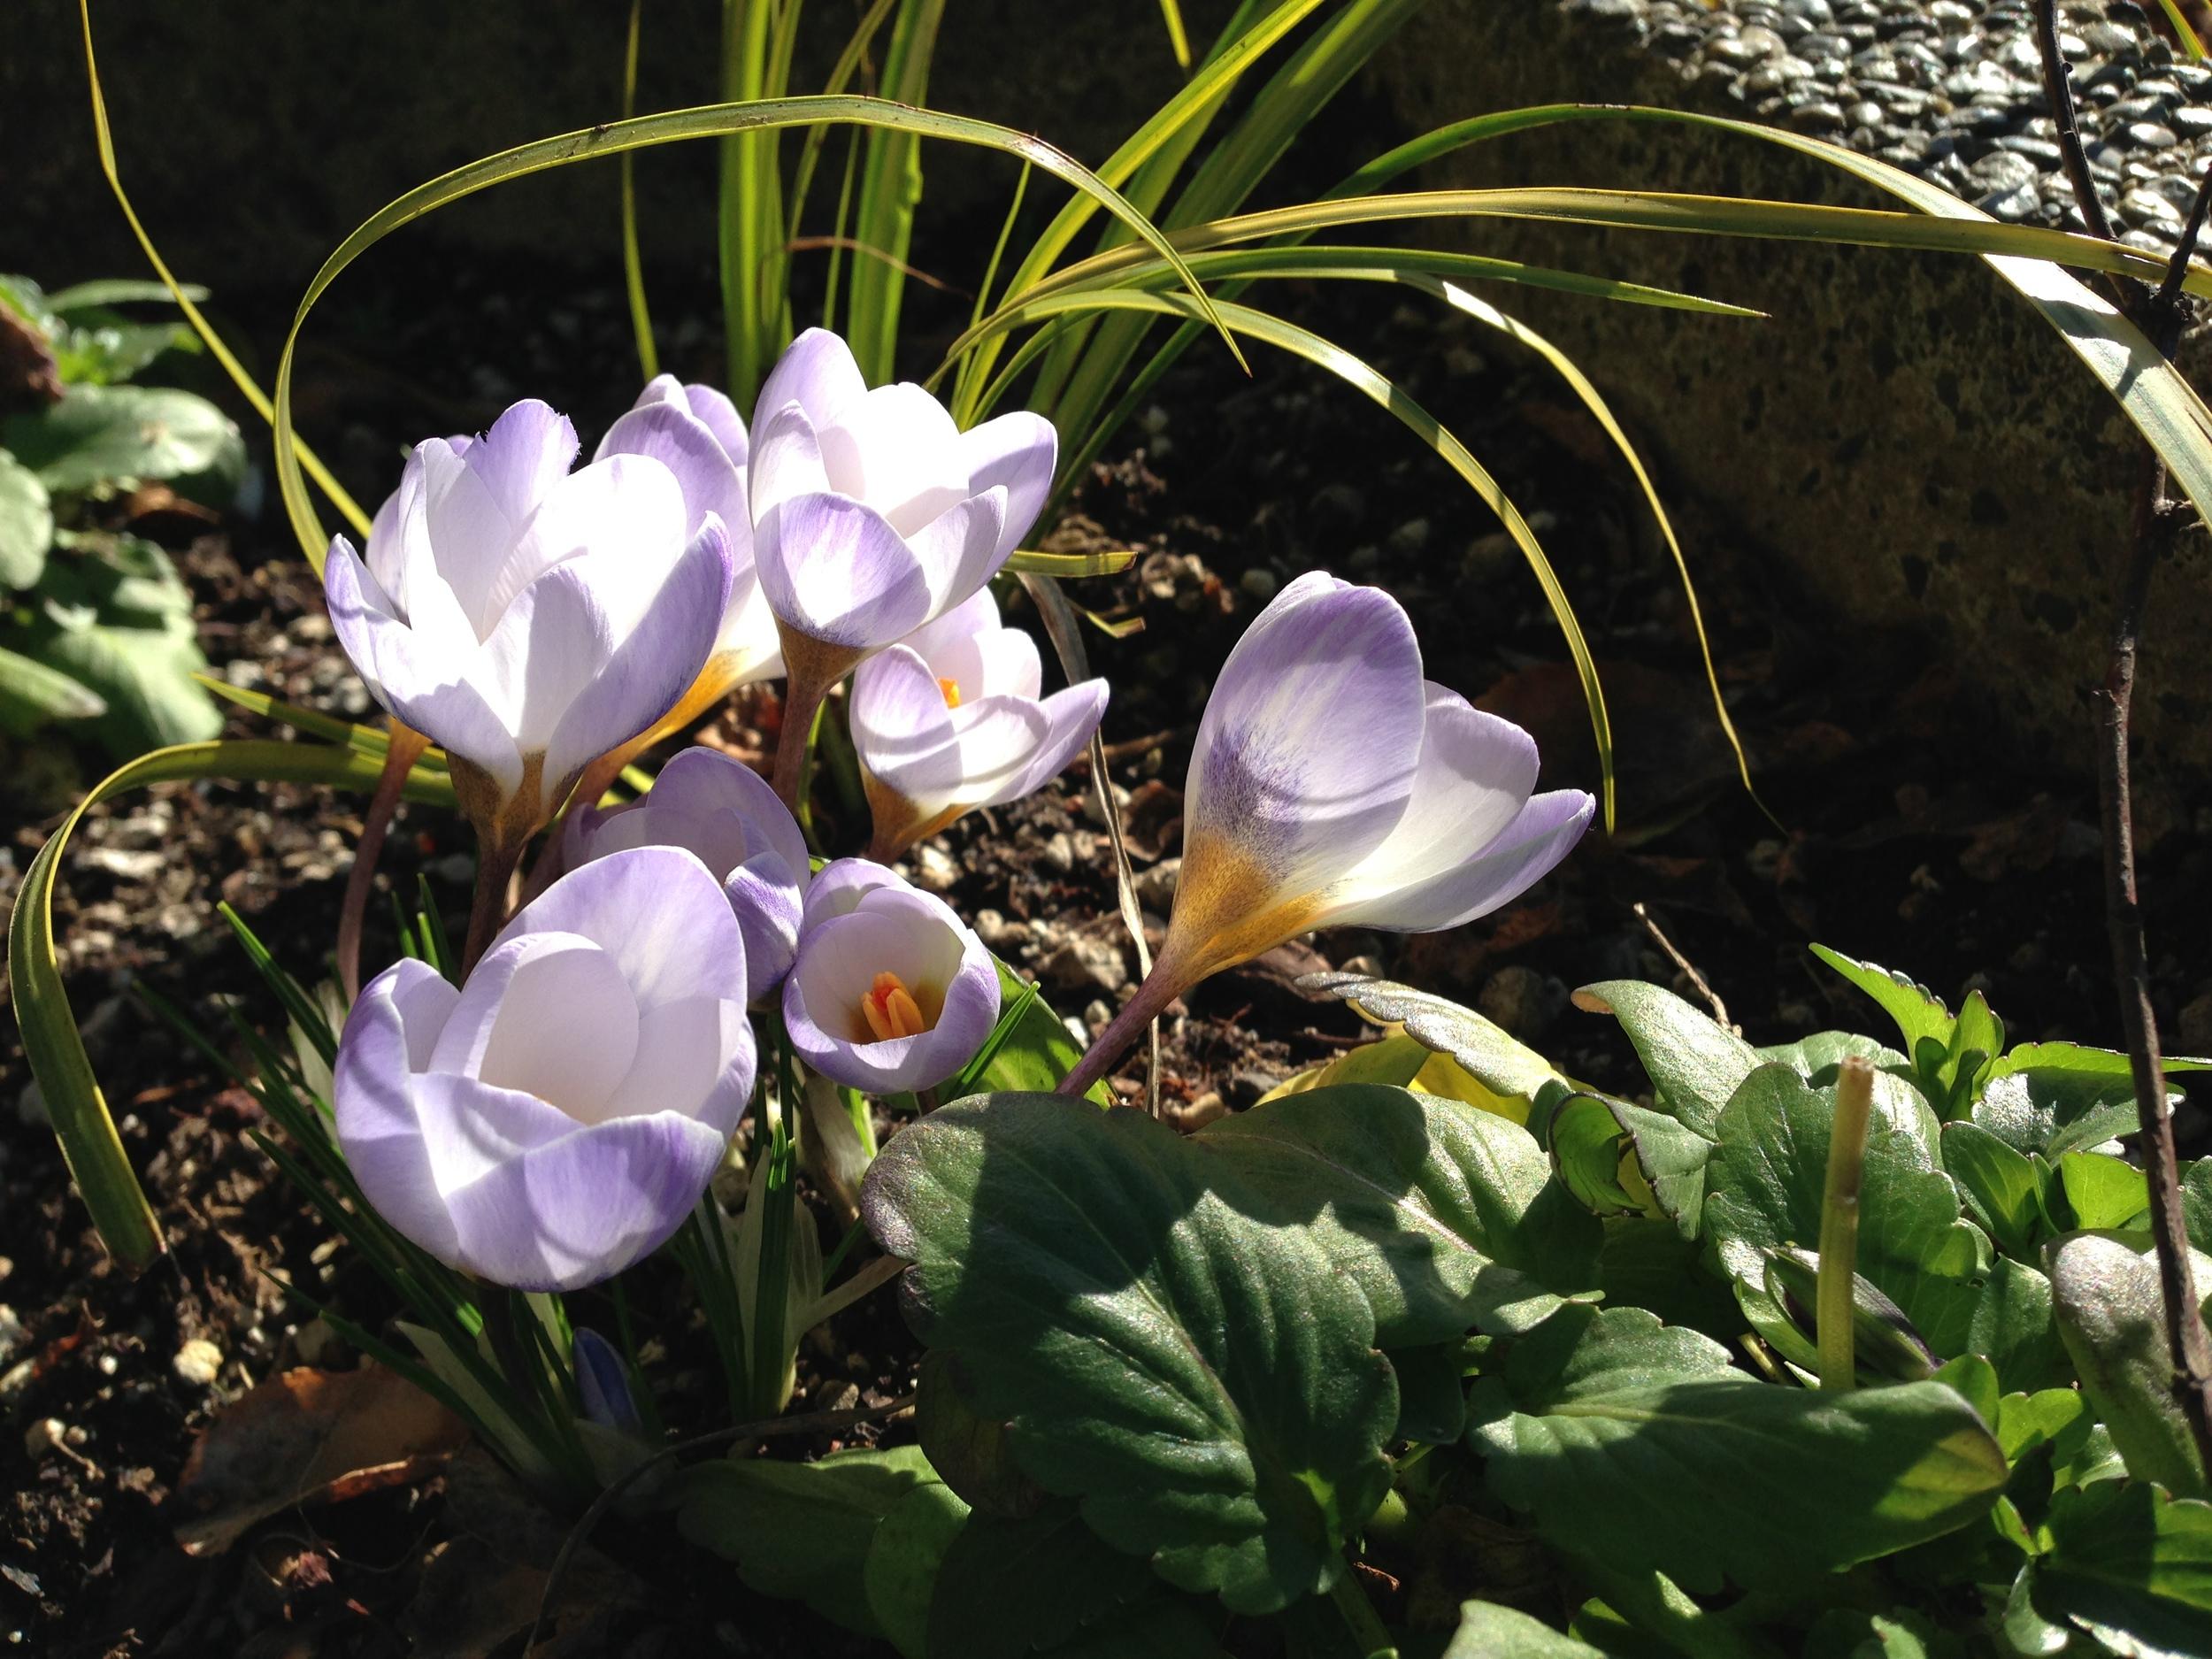 Sun on flowers